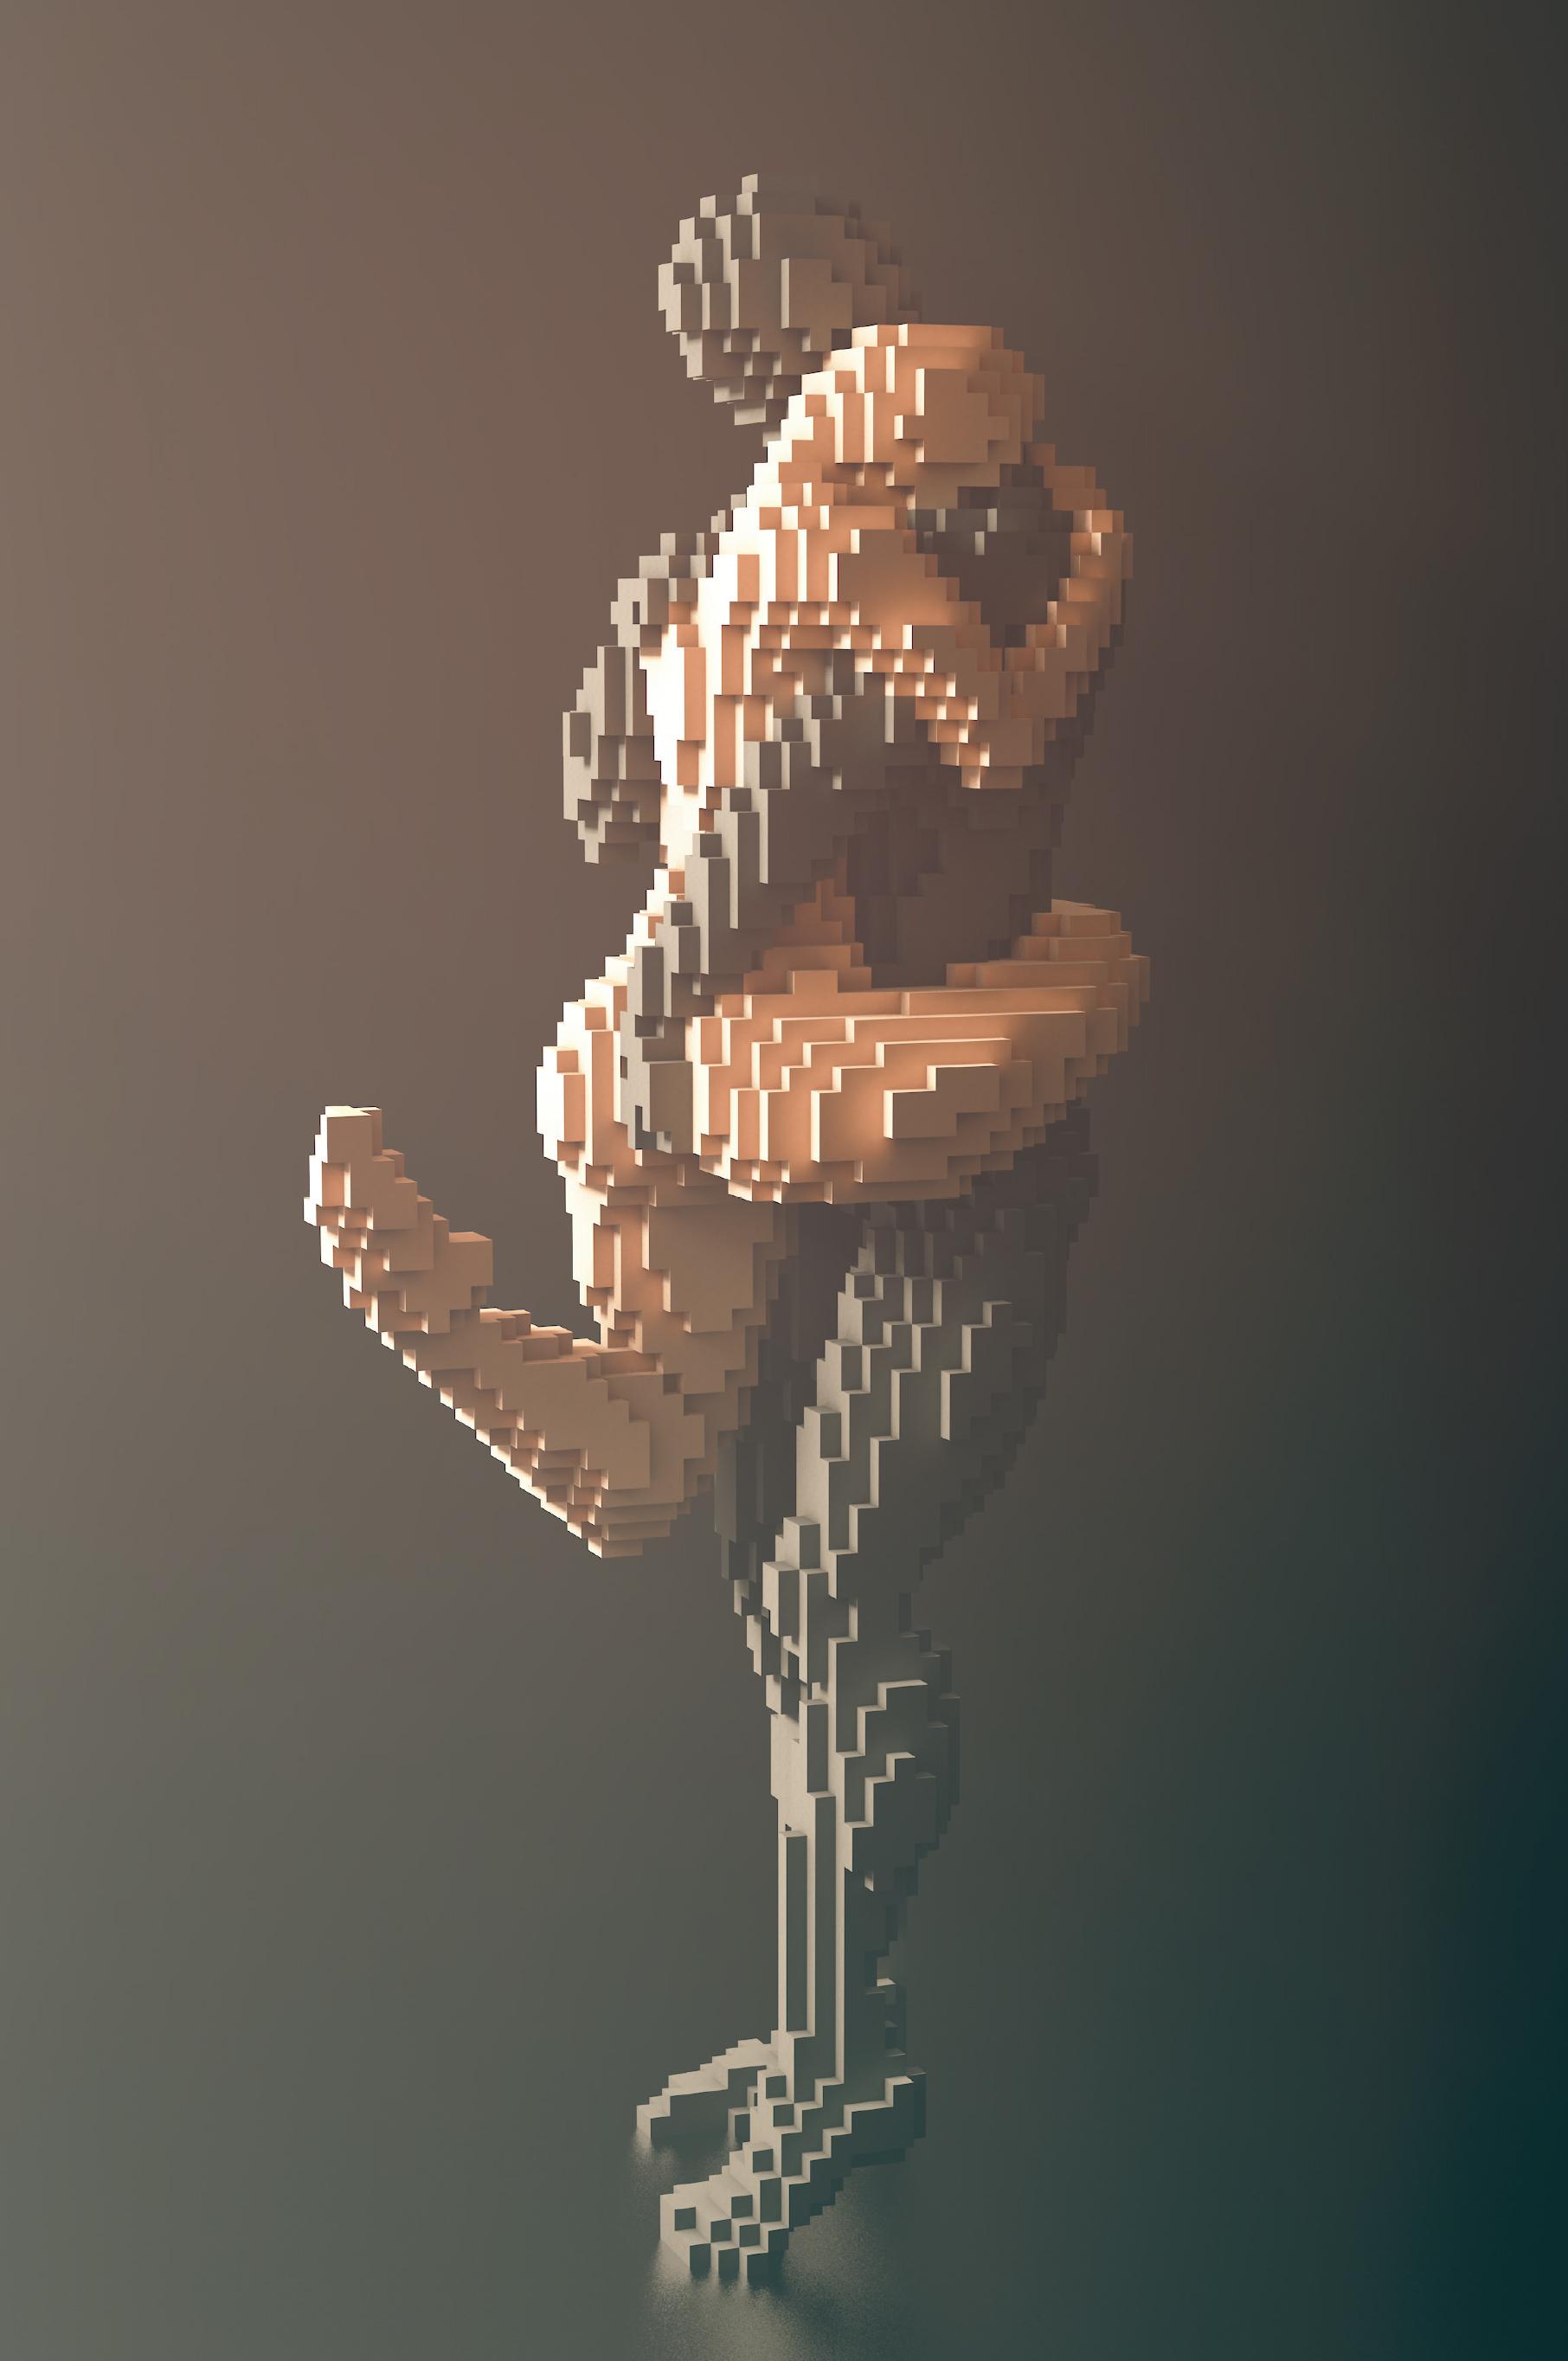 Minecraft art from Blockworks and Beautiful Minecraft